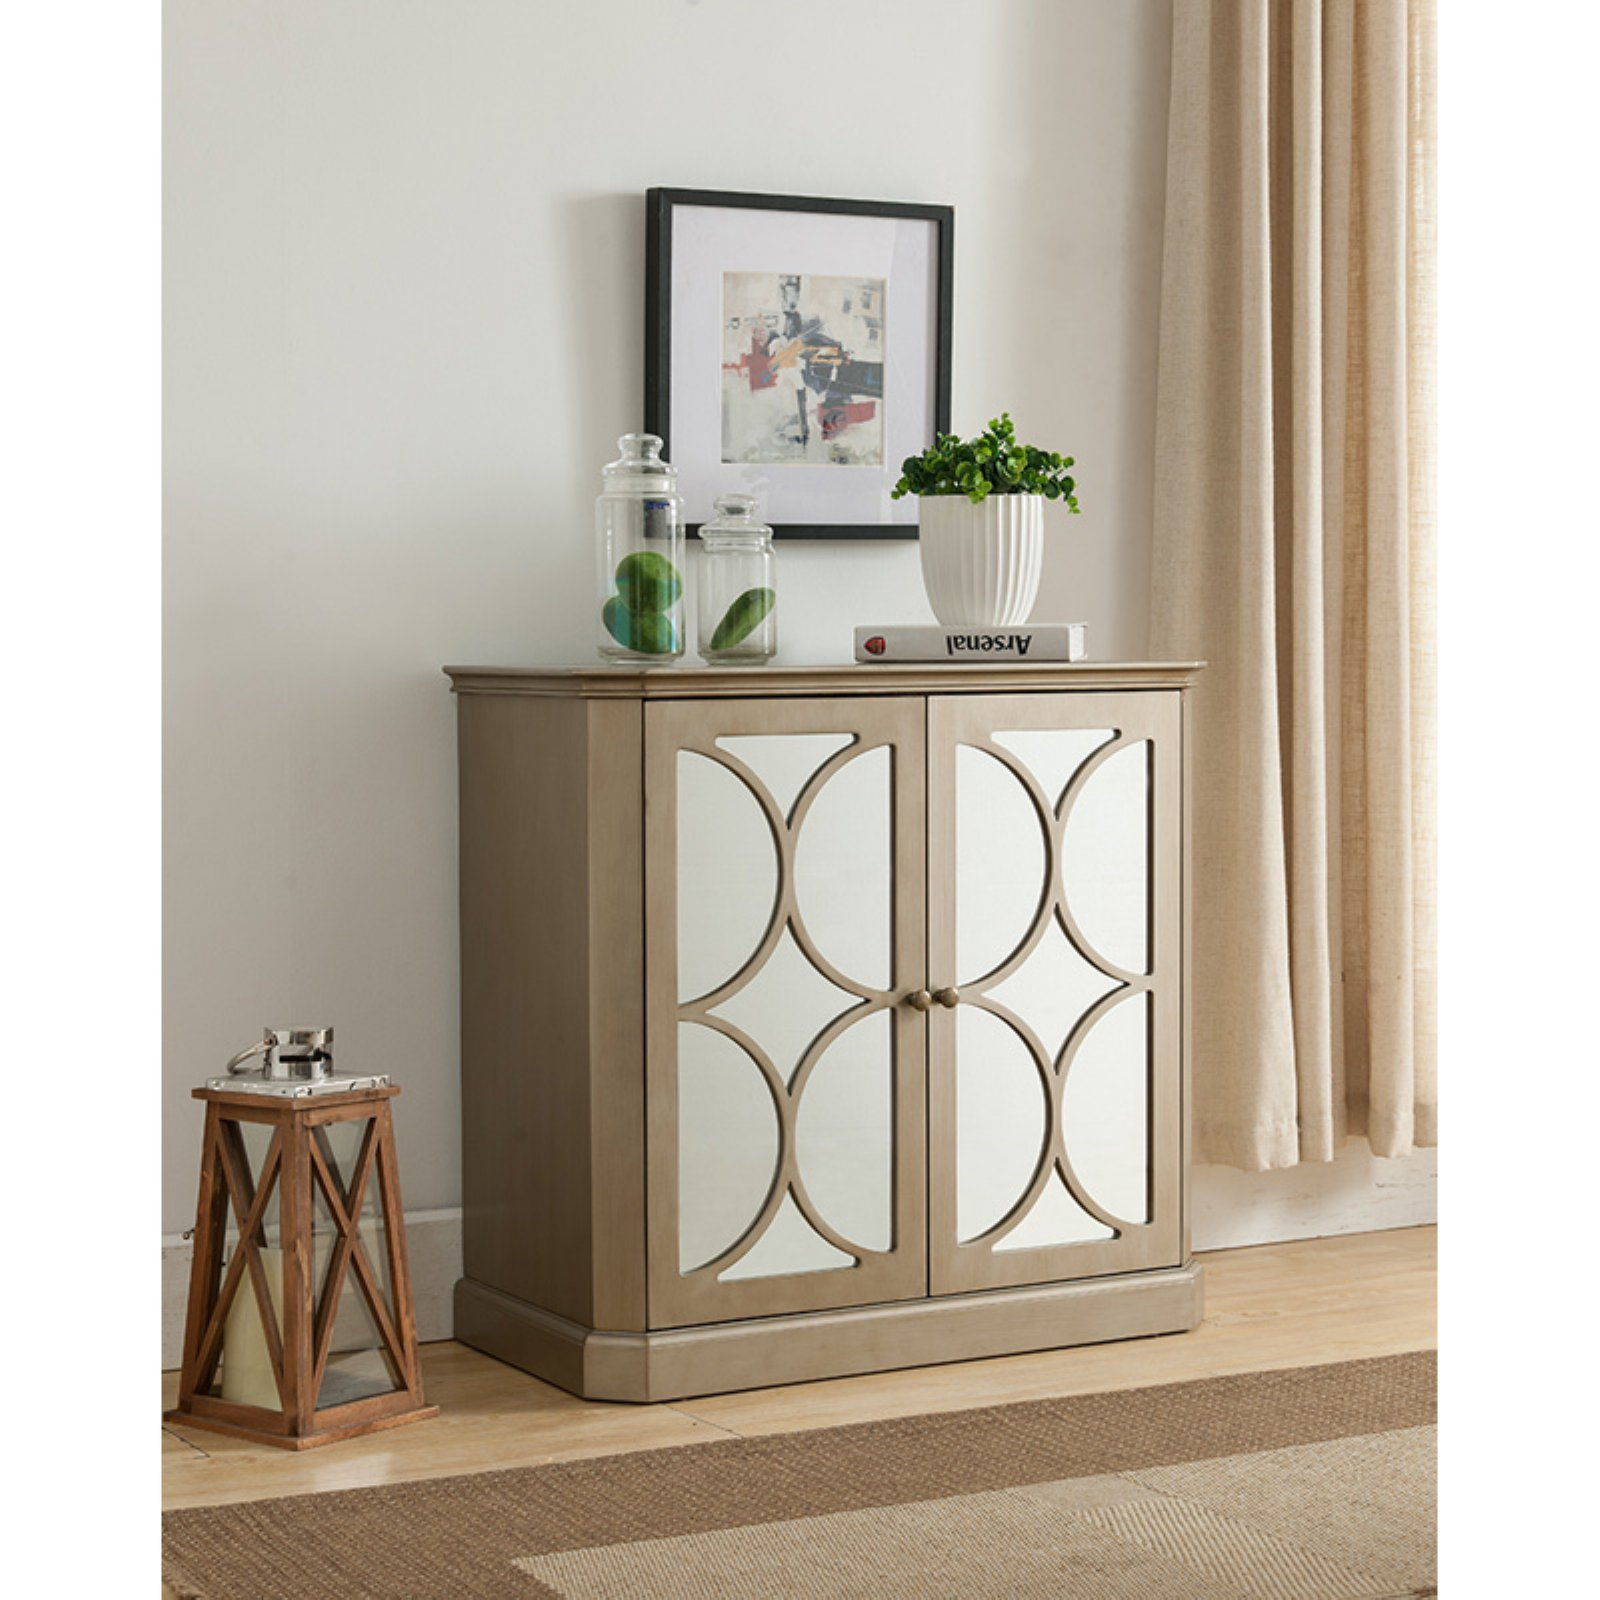 K&B Furniture Gold Wood 2 Door Storage Cabinet